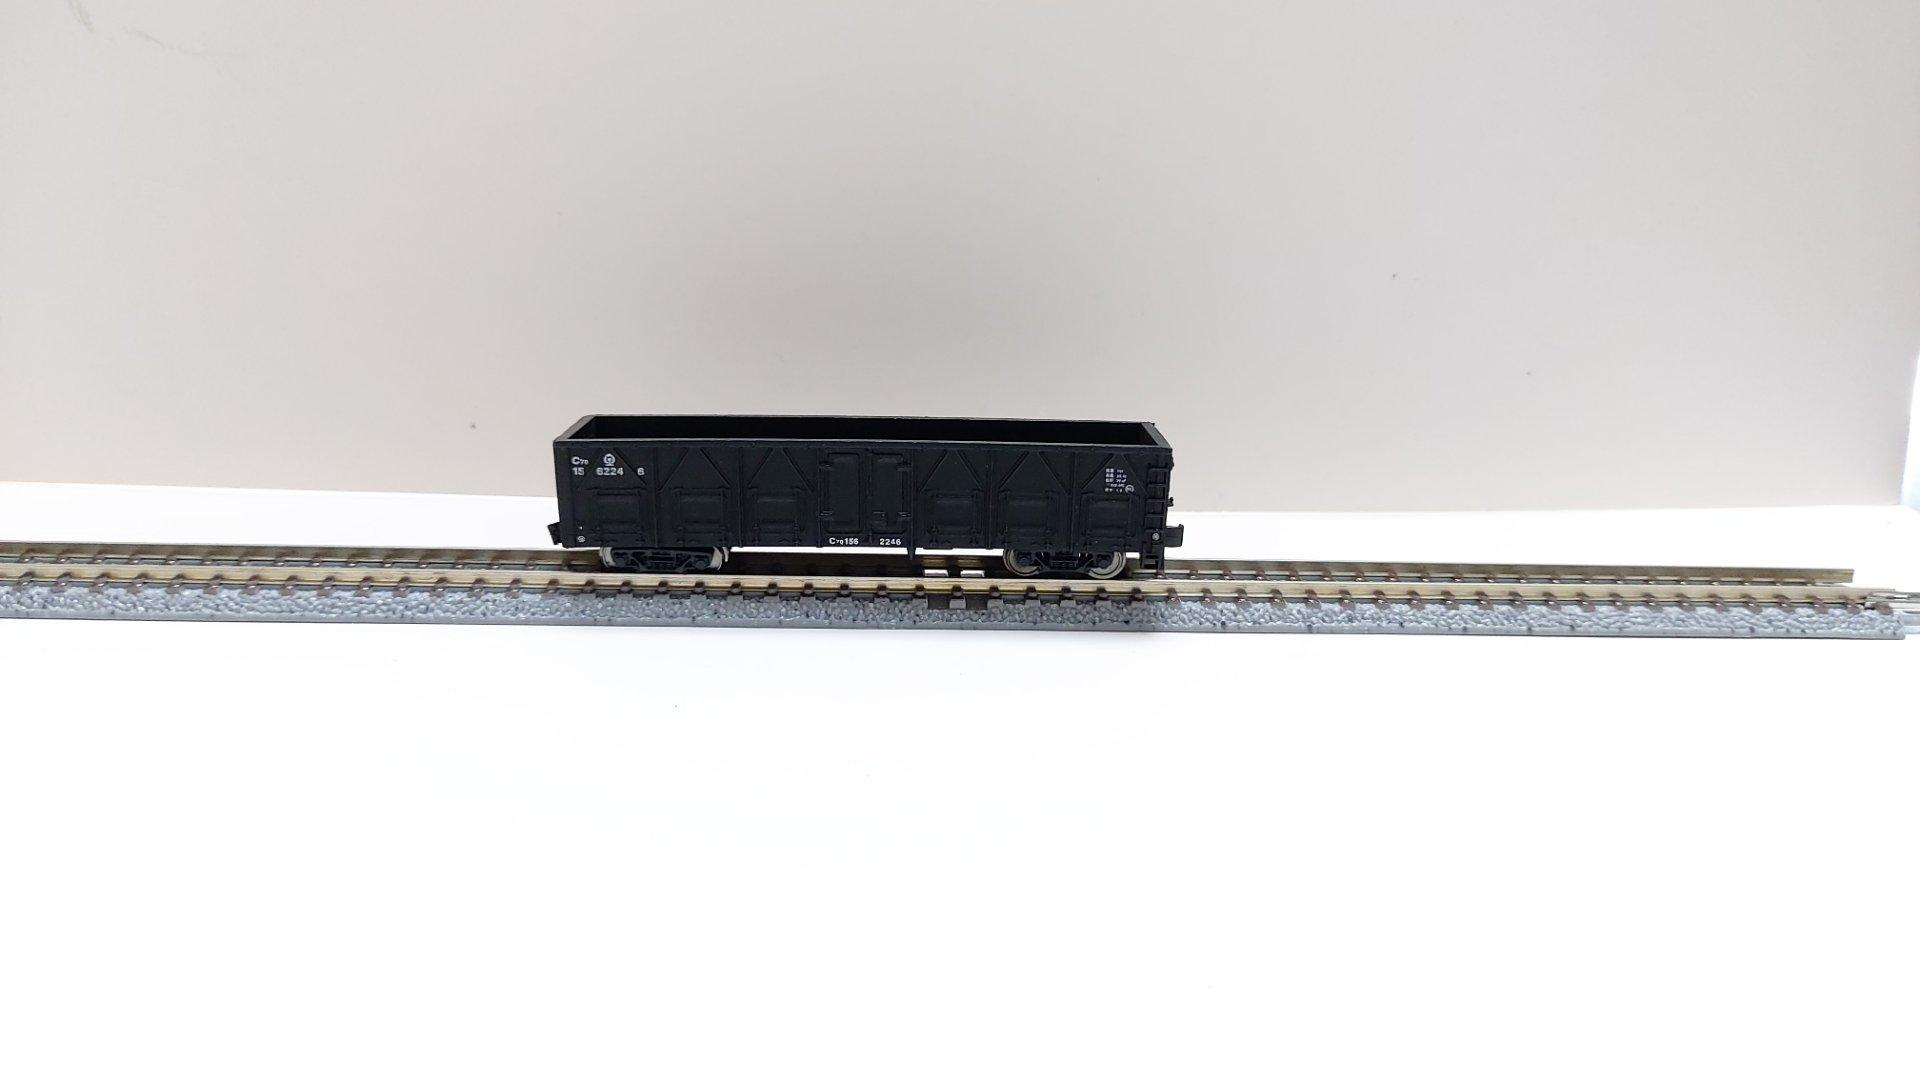 A miniature replica of a railway carriage 4